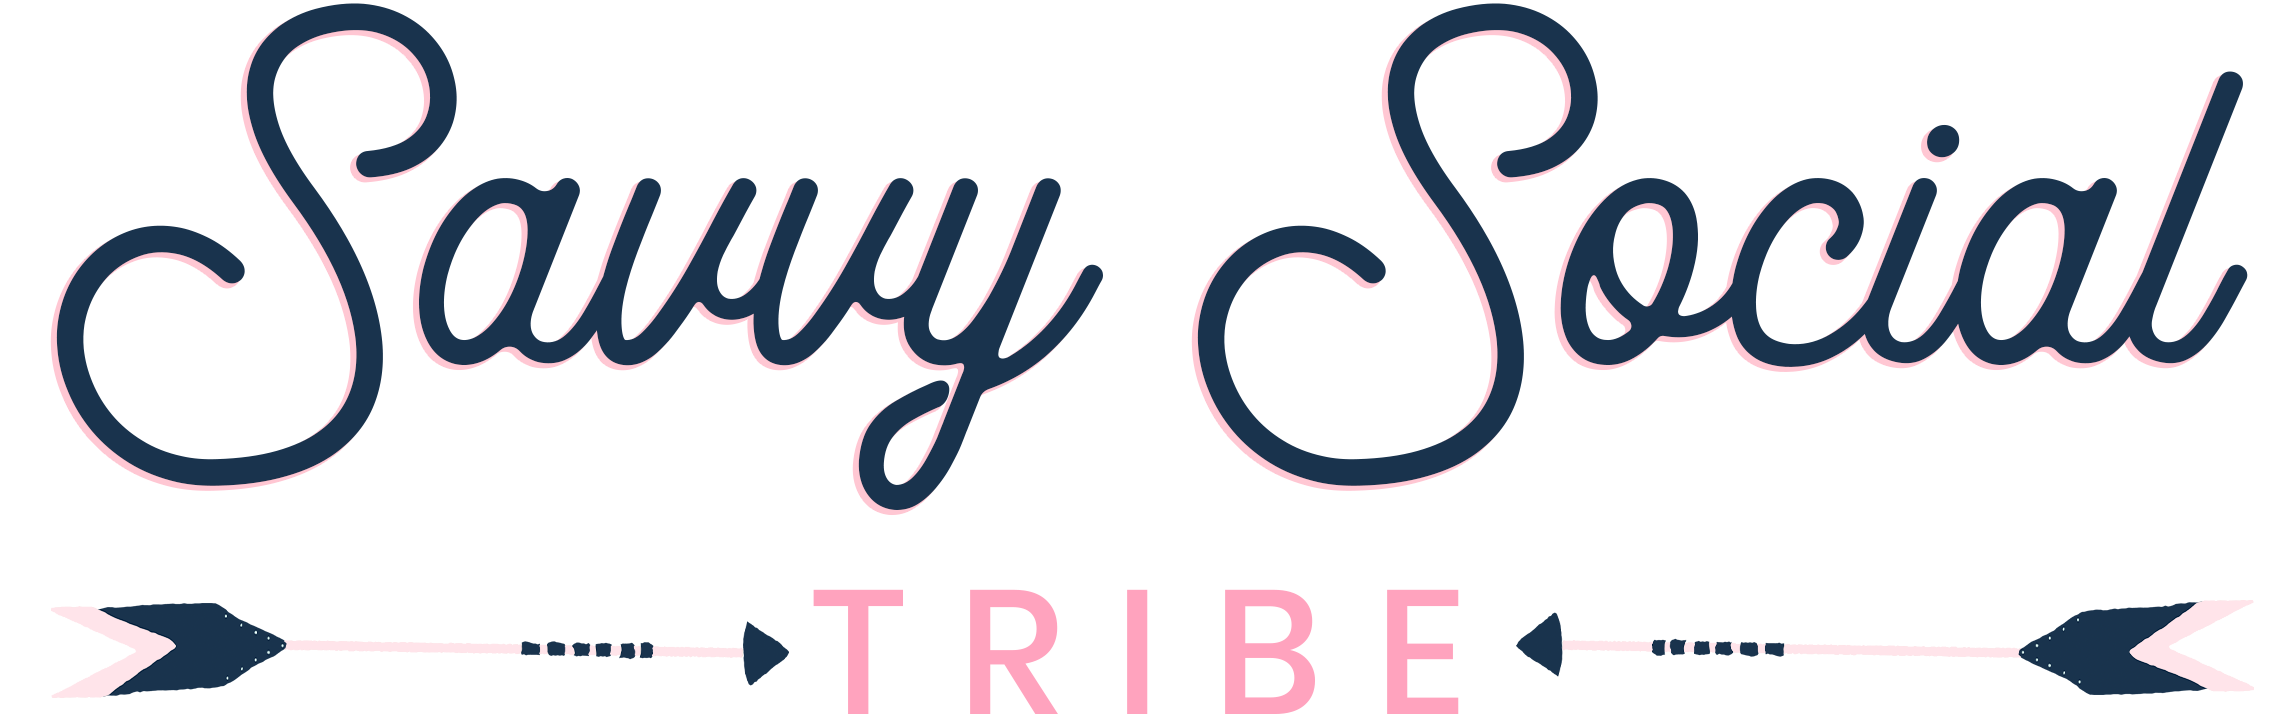 Savvy Social Tribe Mary Kay Customer Facebook Group Service